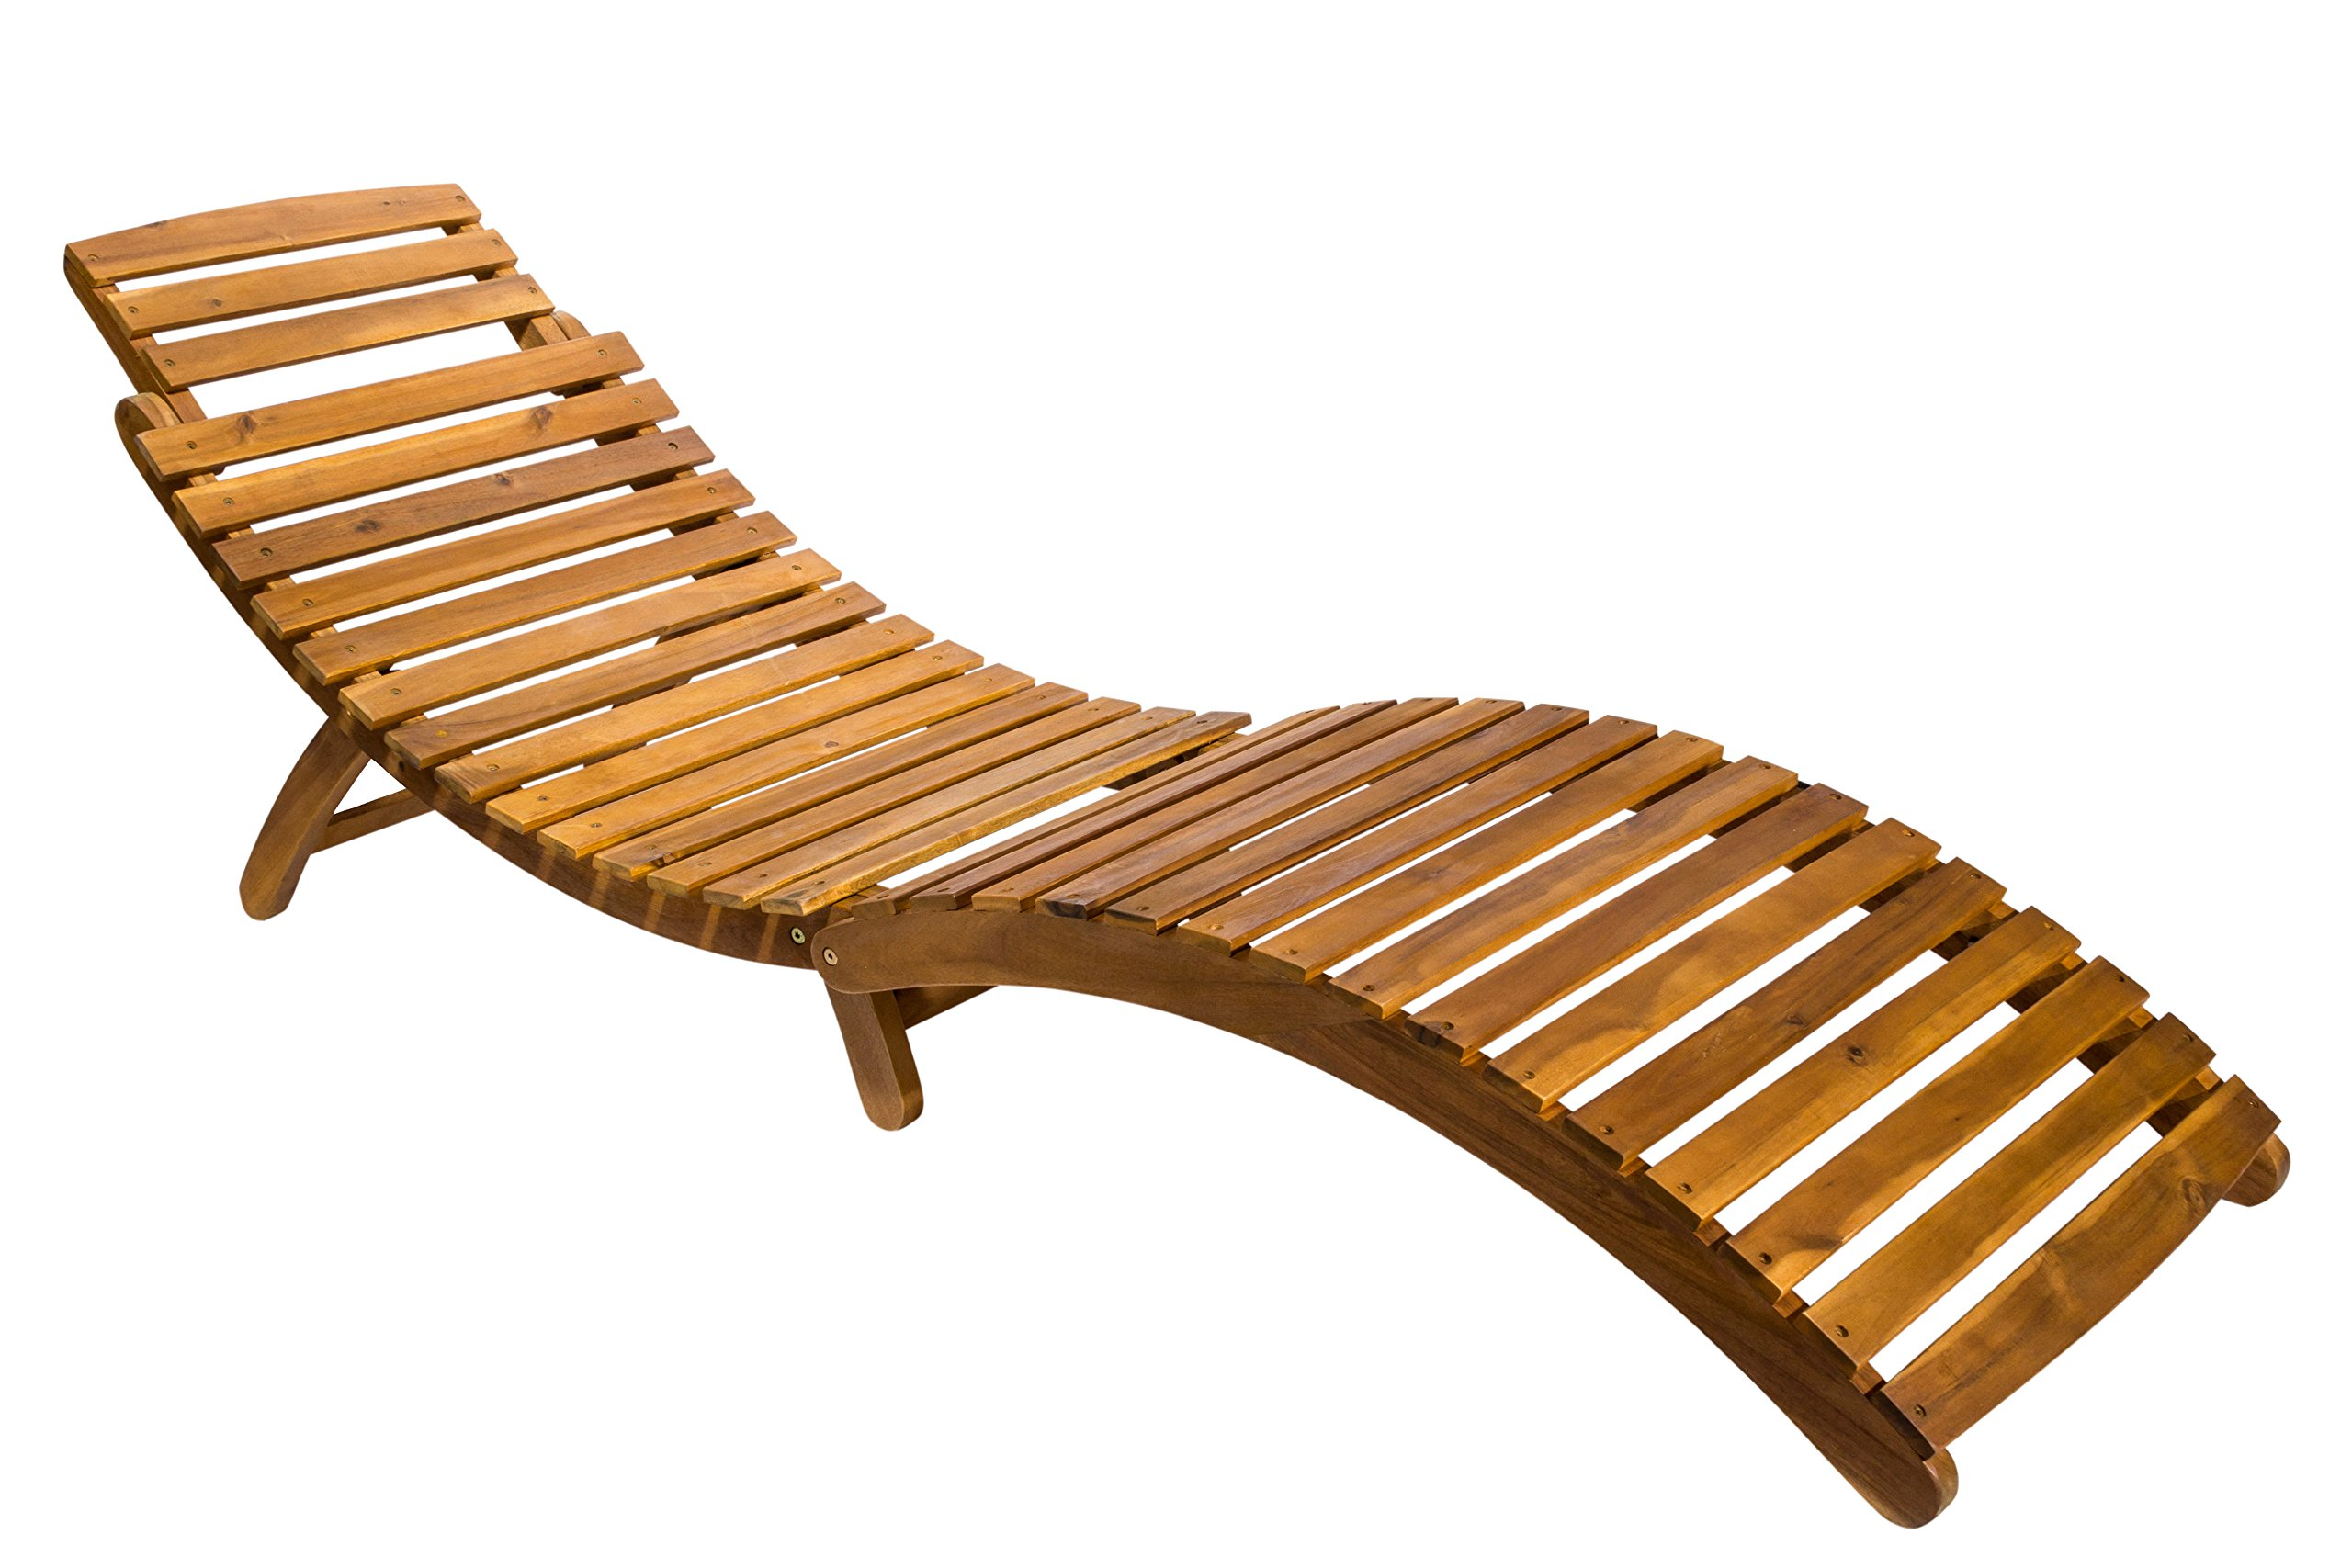 Sonnenliege Klappbar Holz.Sam Gartenliege Rio Klappbar Akazien Holz Geölt Sonnenliege Mit Tragegriff Massives Gartenmöbel Fsc 100 Zertifiziert Ratgeber Haus Garten